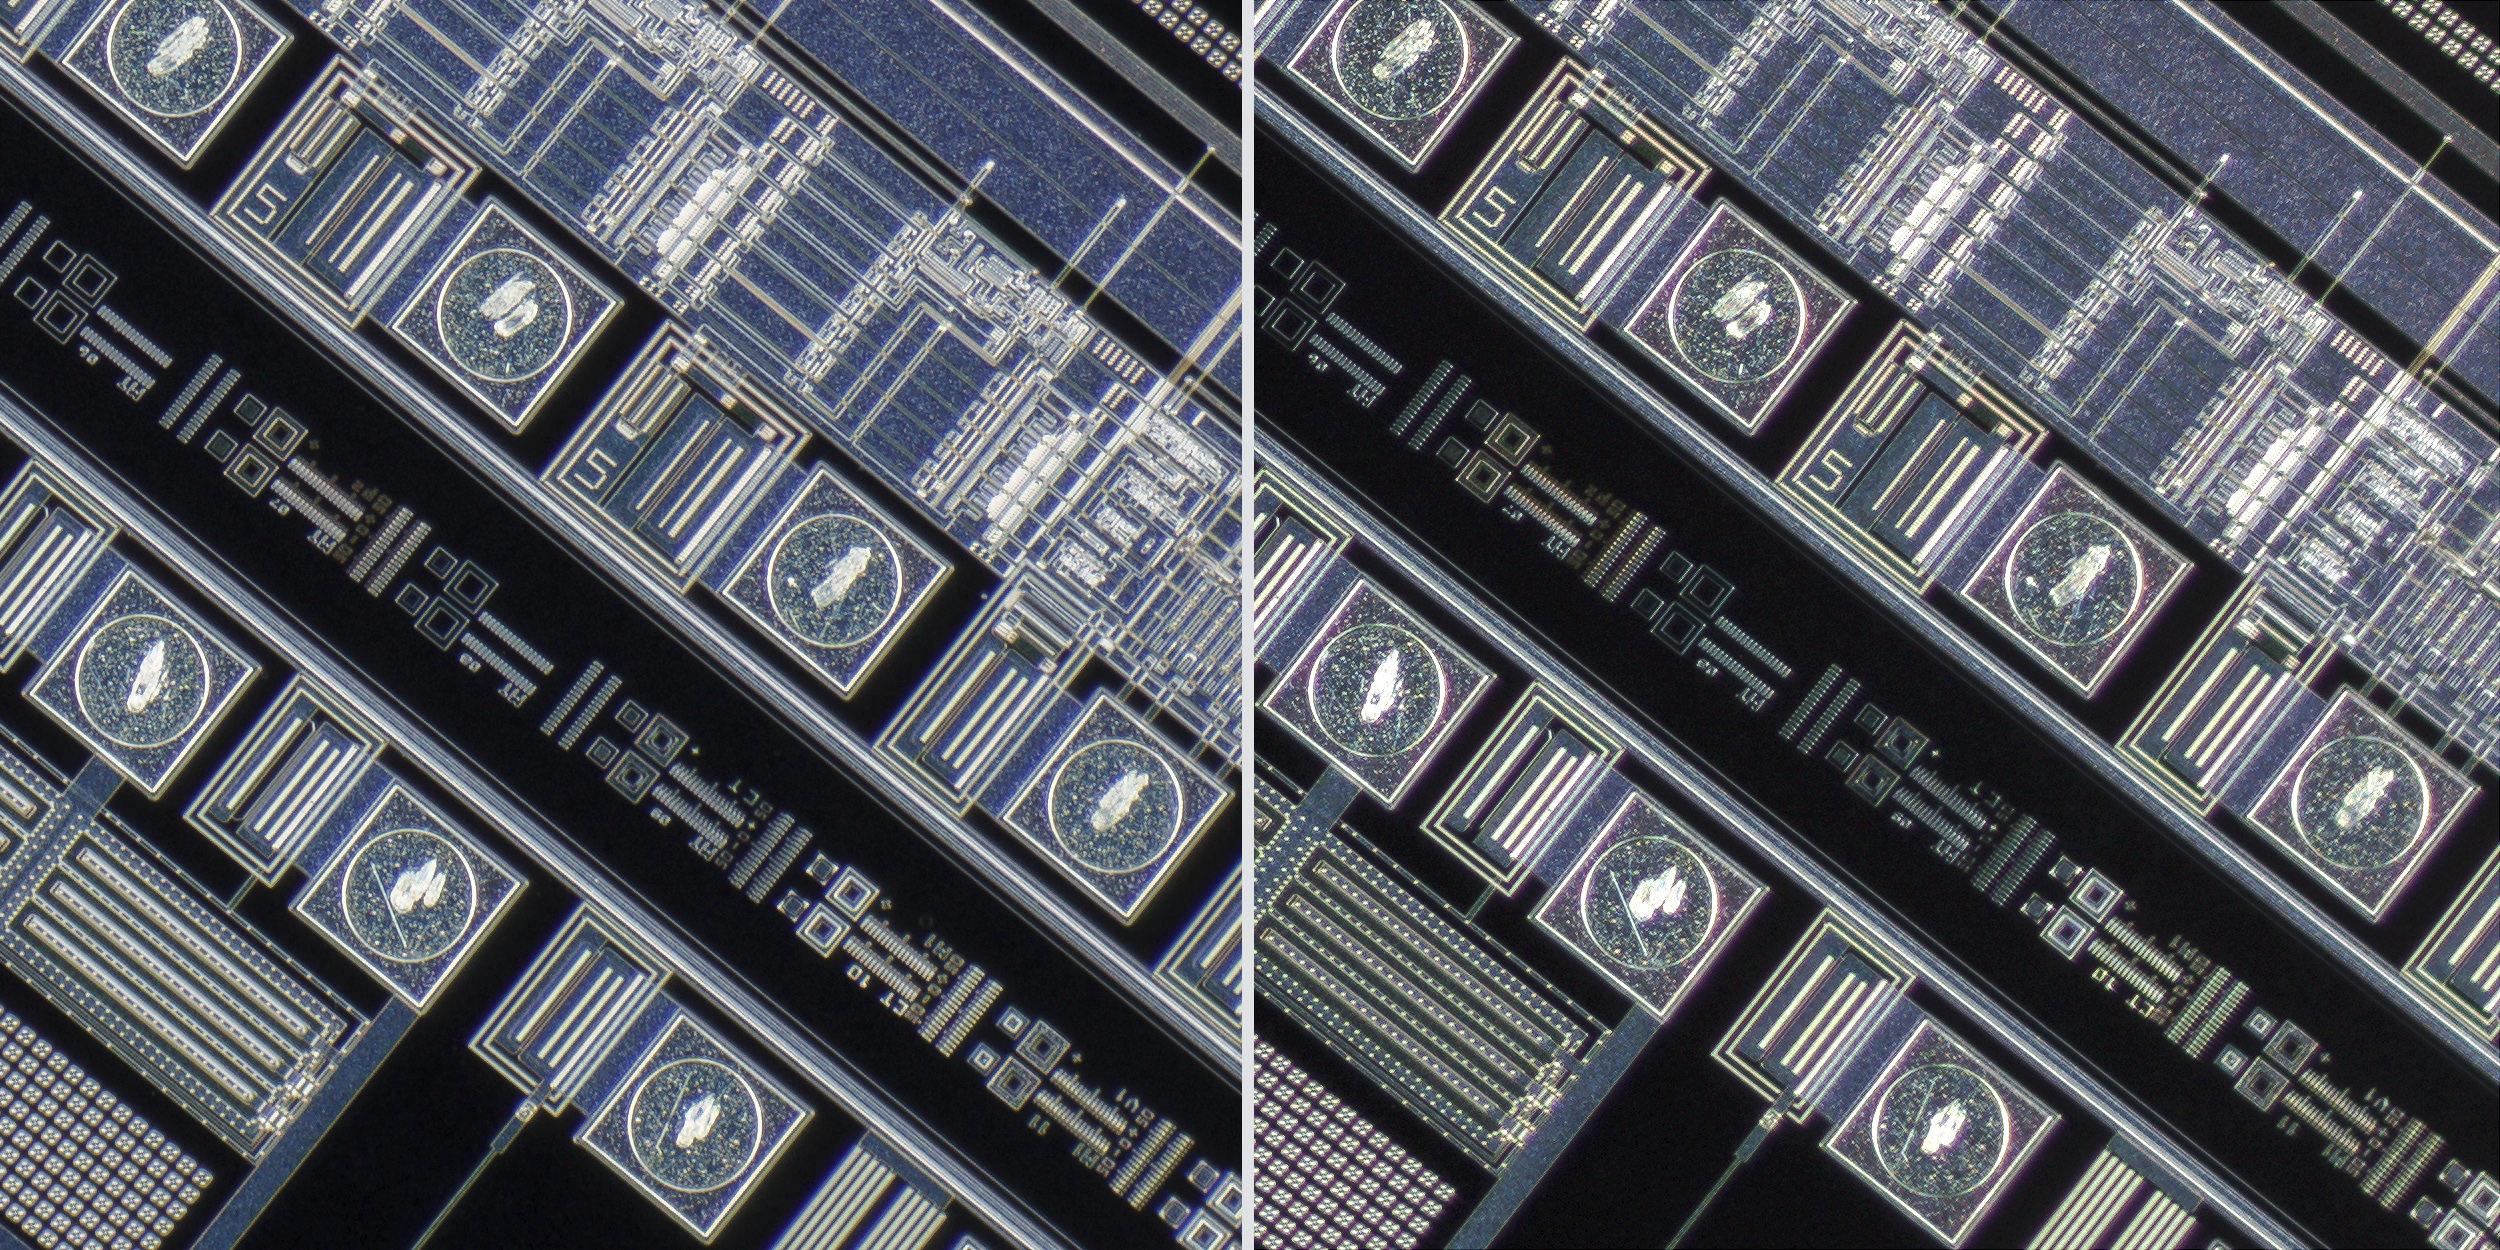 Mitutoyo M Plan Apo 5X 0.14 objective vs Sigma 150 f2.8 OS + Xenon 28mm f2 Line Scan Lens 100% Corner Crops